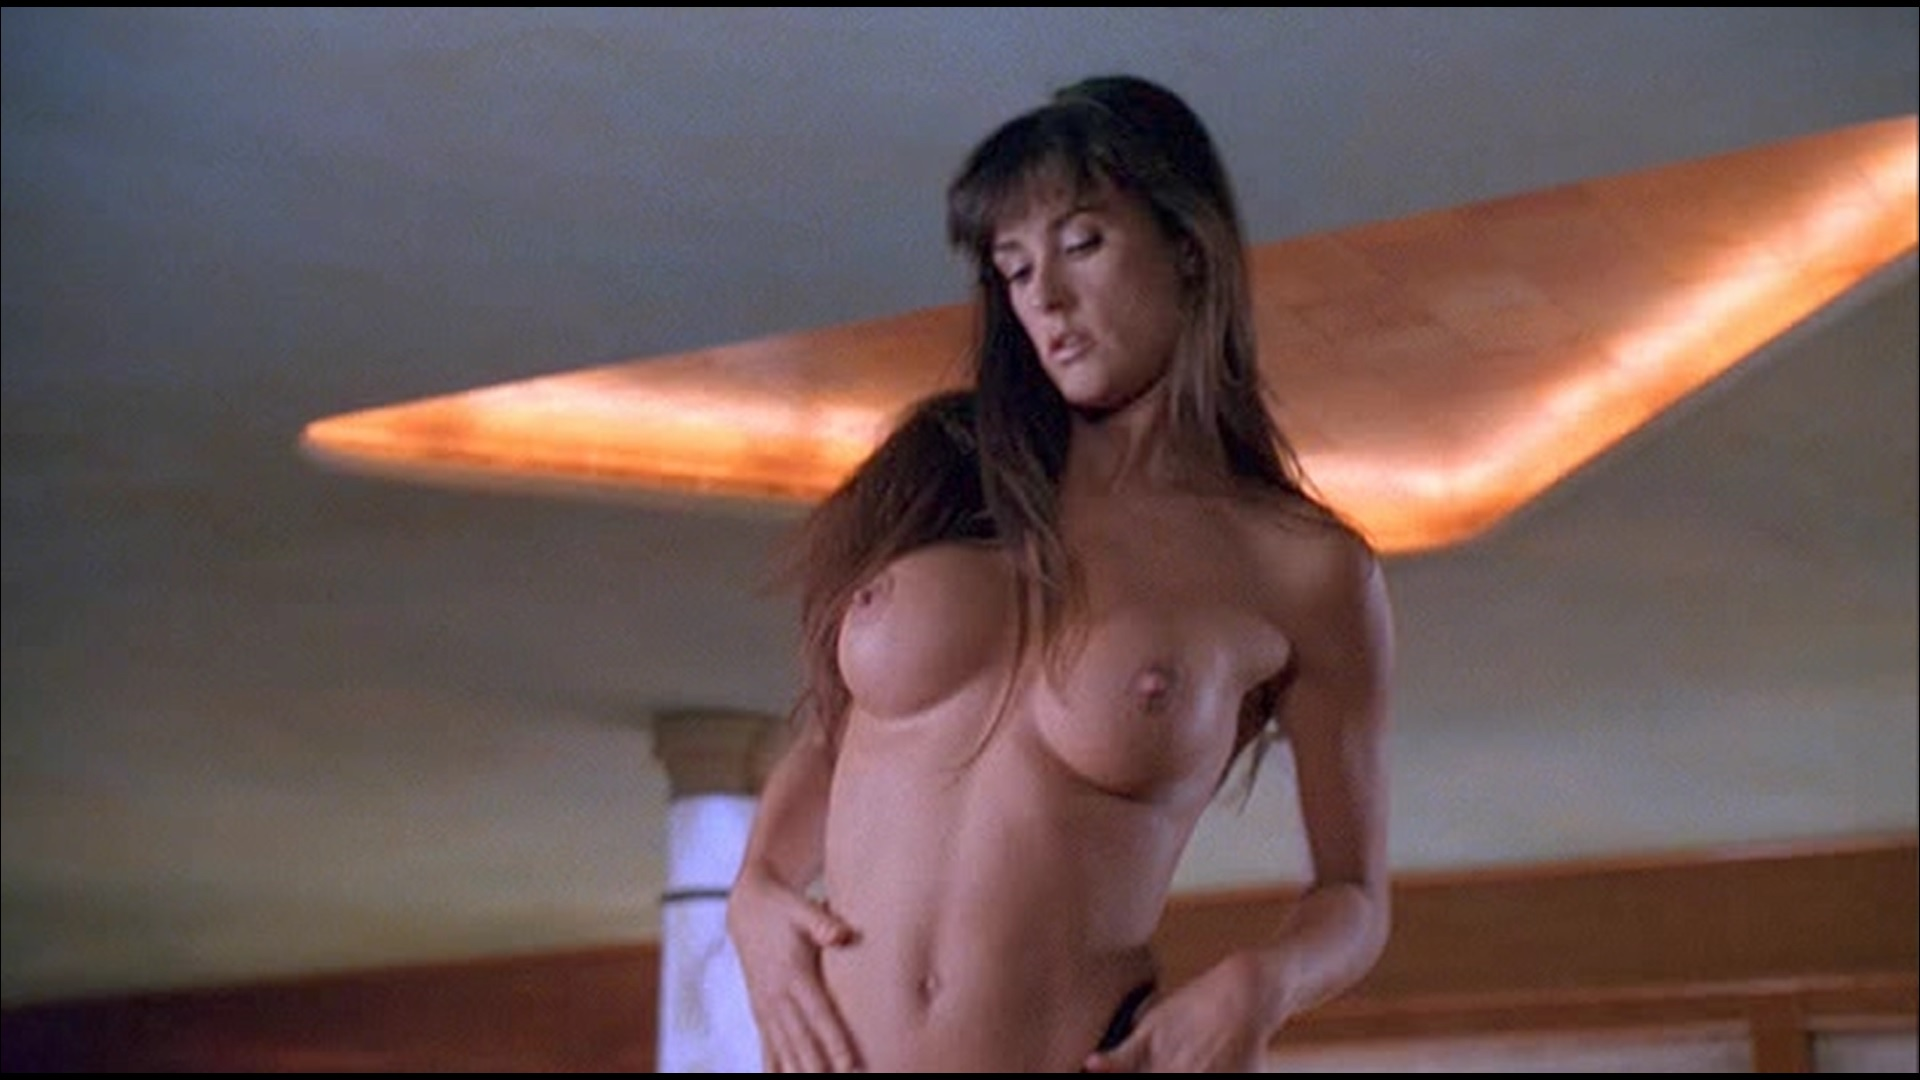 Marisa miller perfect 10 topless